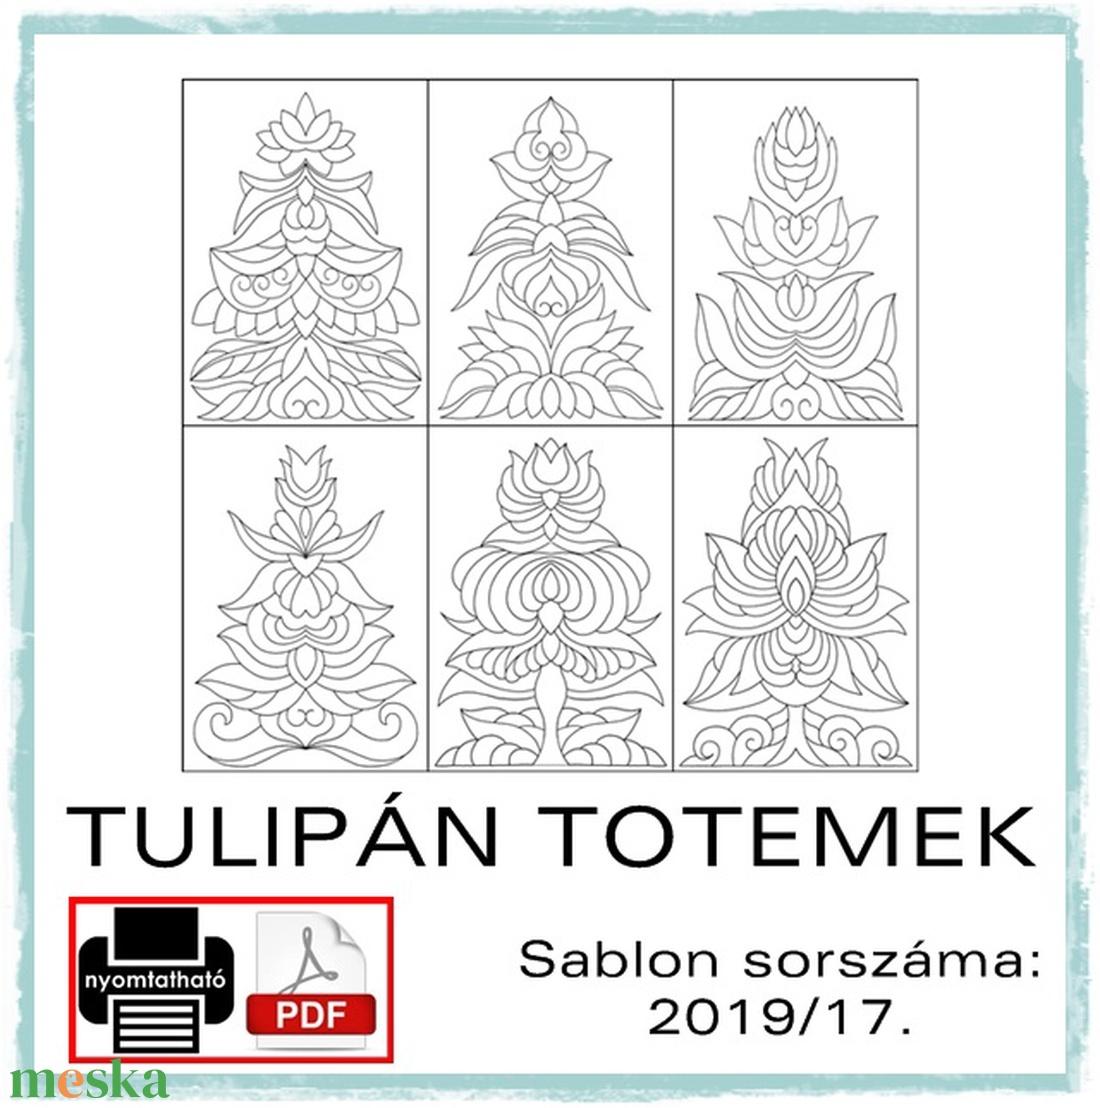 Tulipán totemek 2019/17. (kedo) - Meska.hu